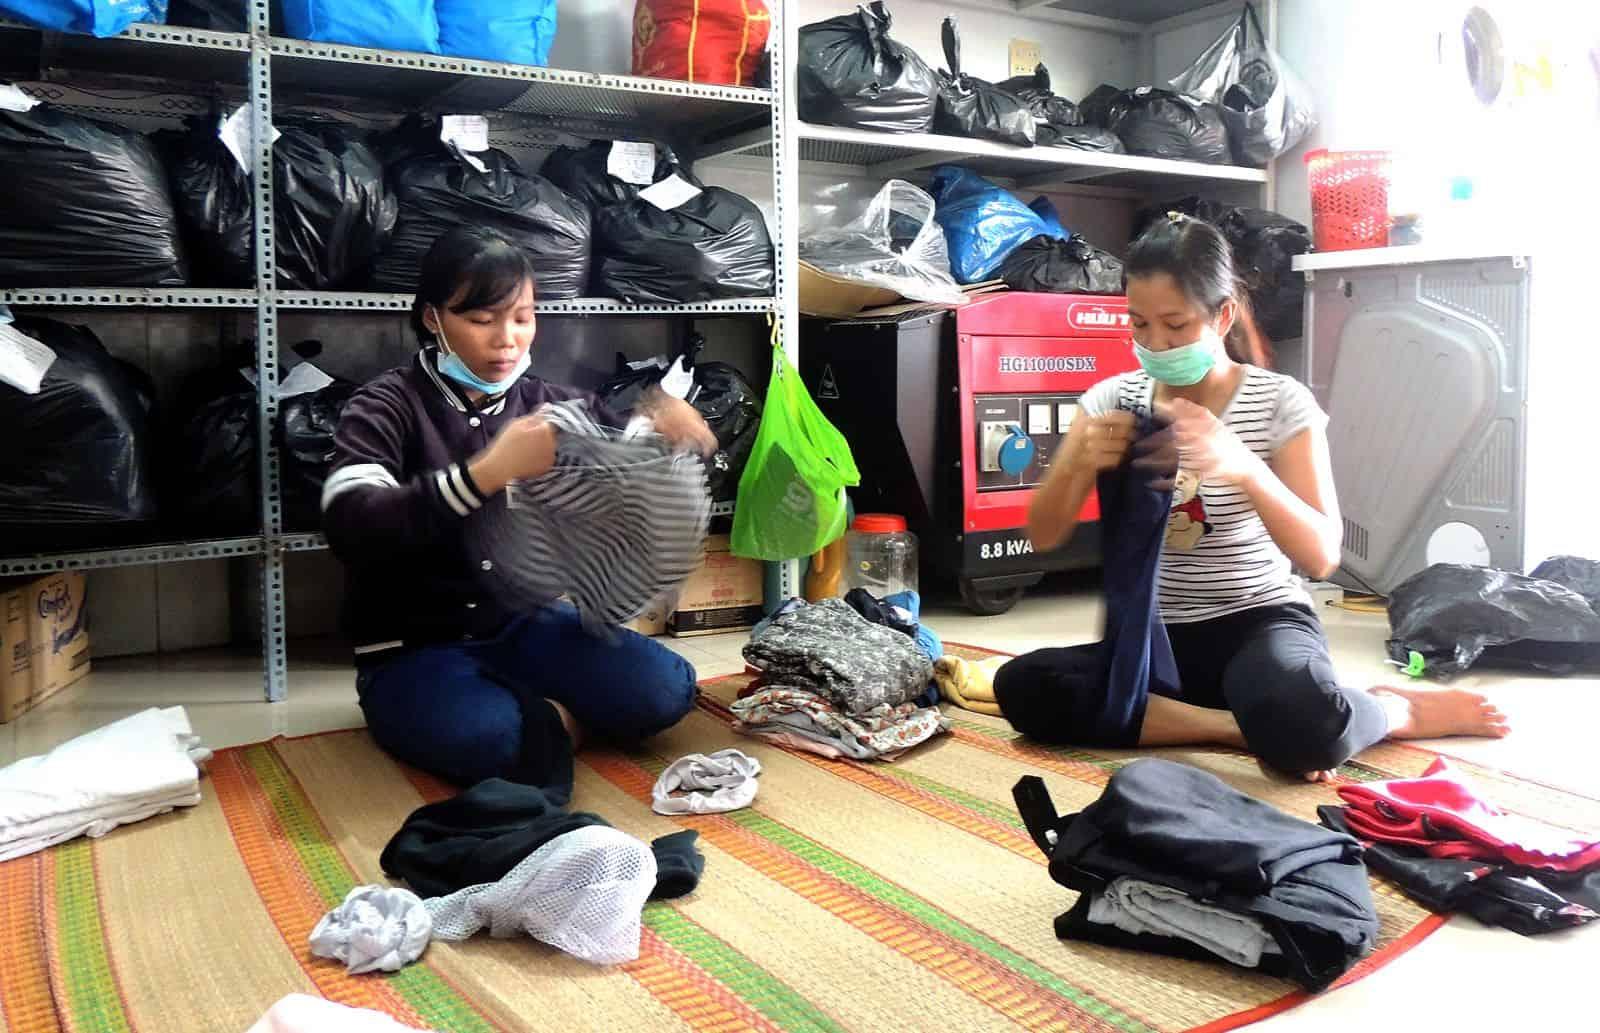 Vietnam laundromat